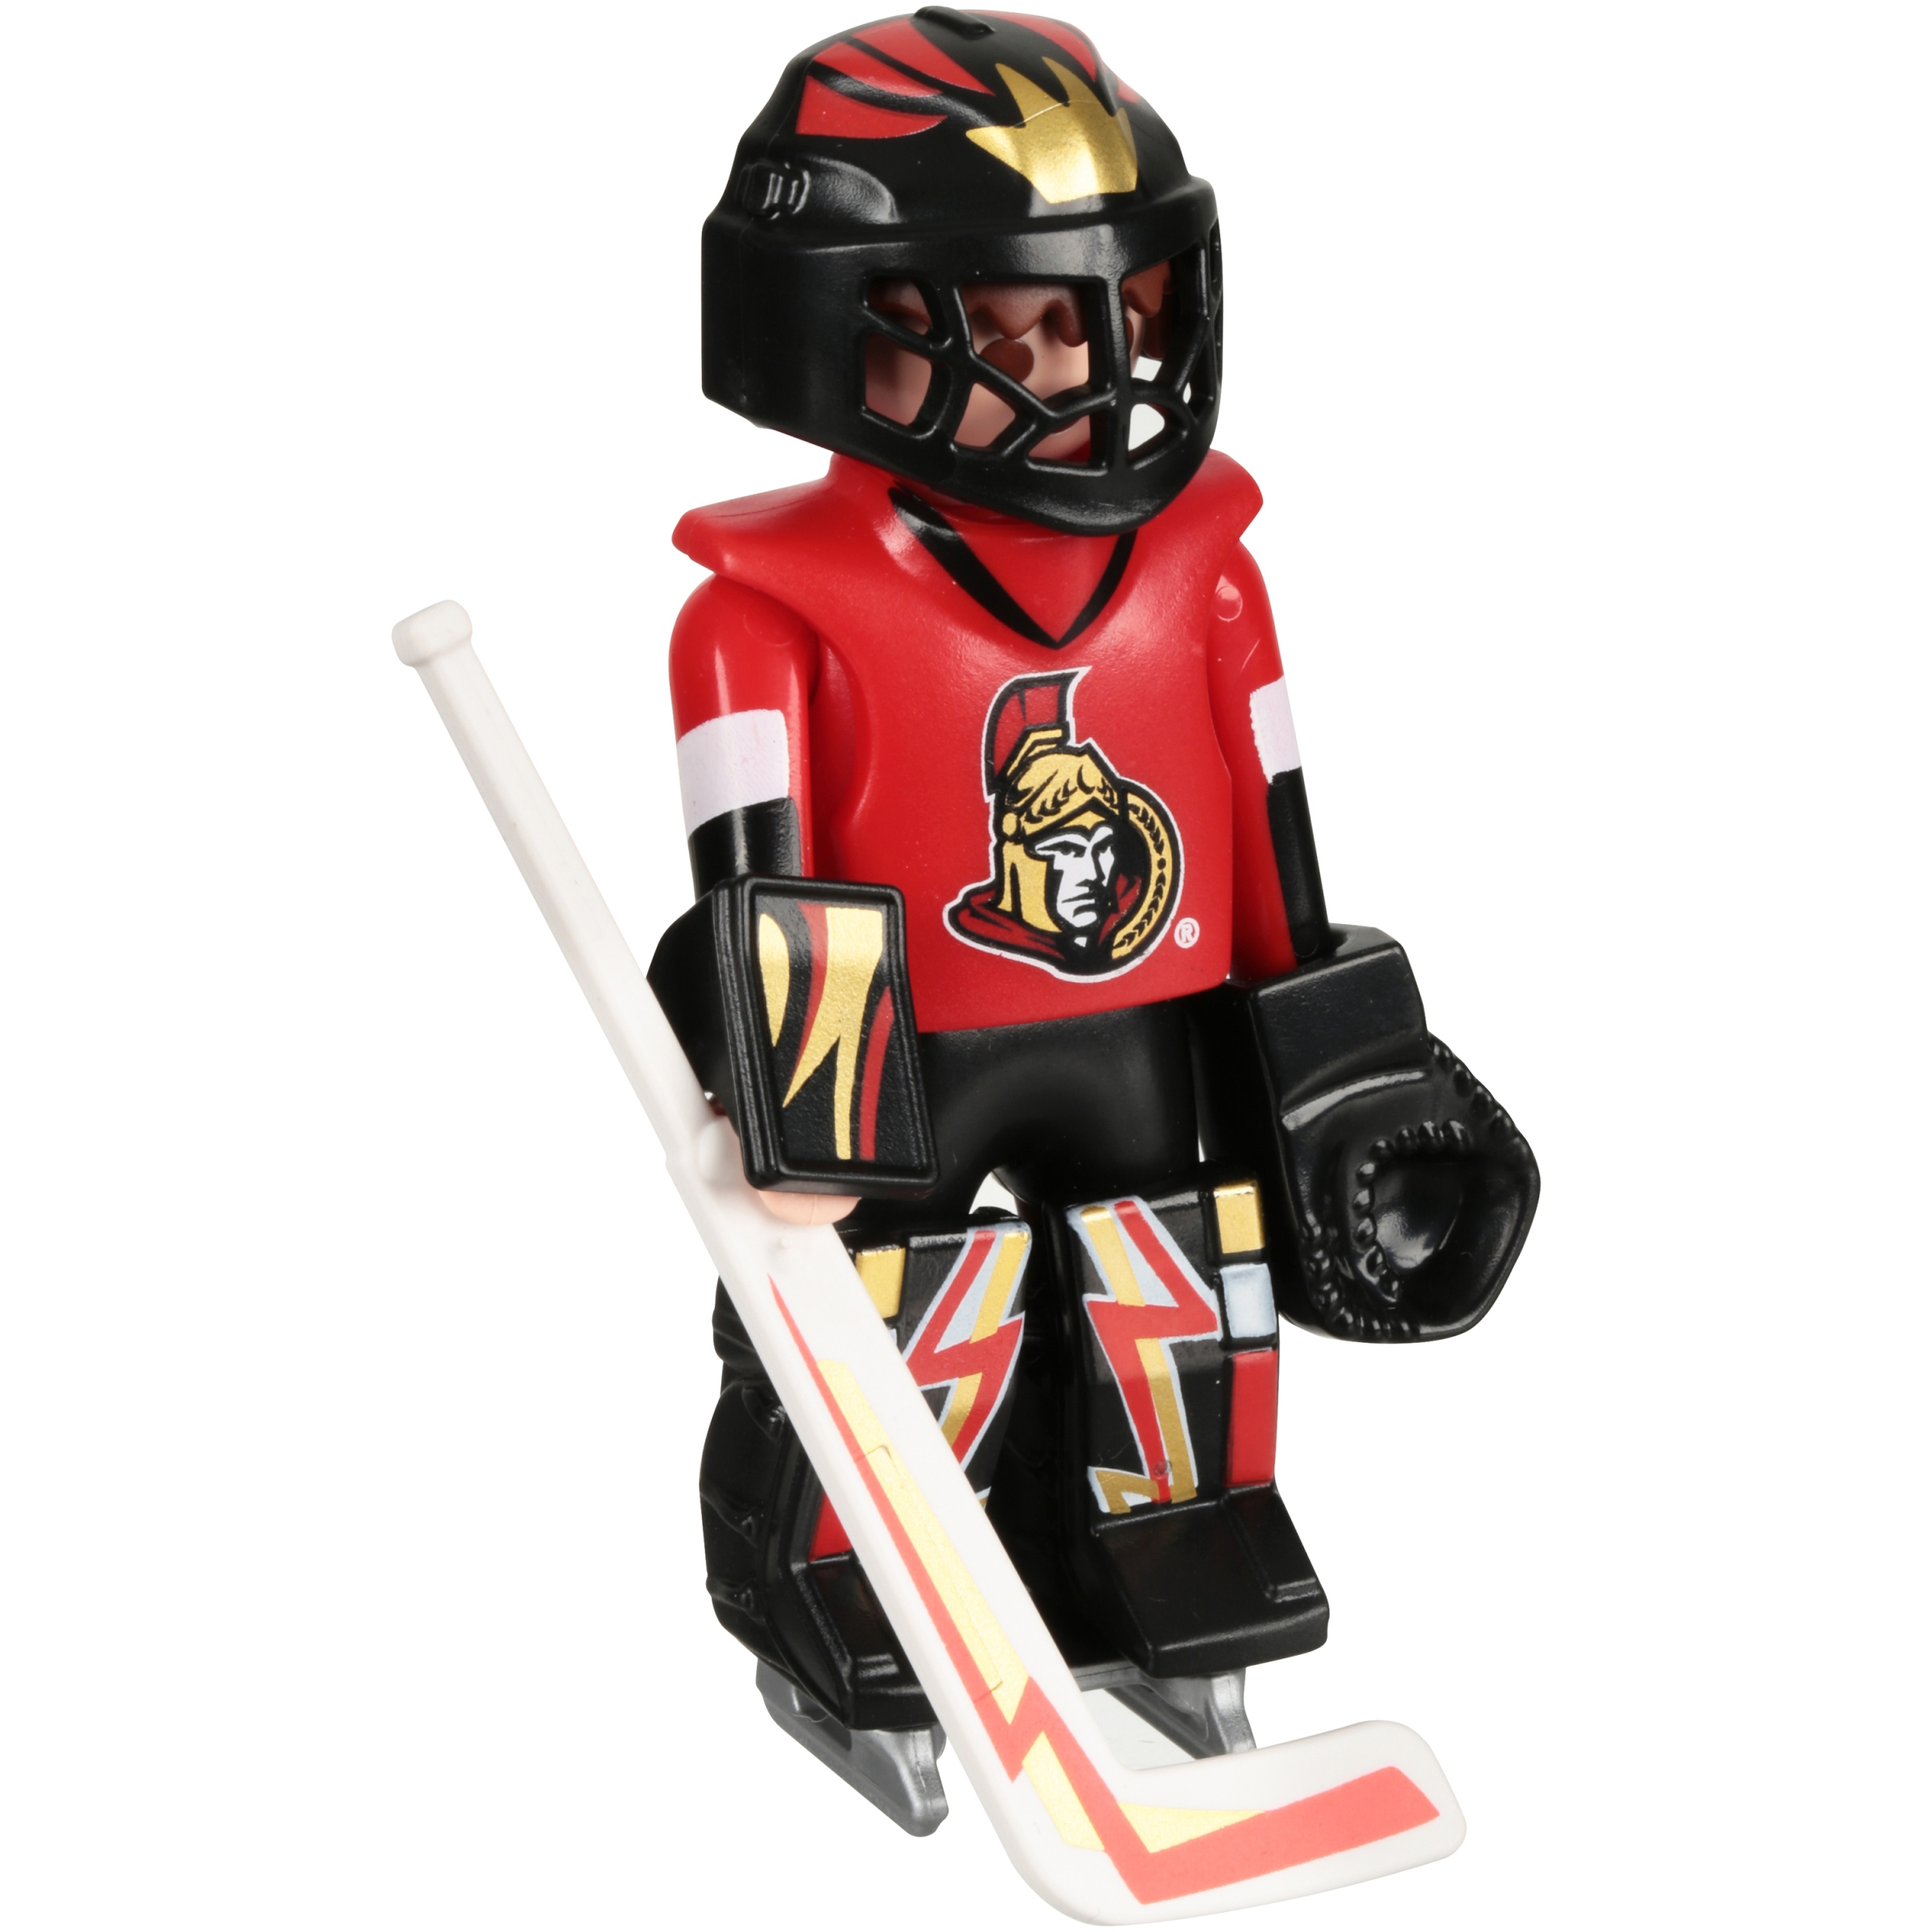 PLAYMOBIL NHL Ottowa Senators Goalie Figure